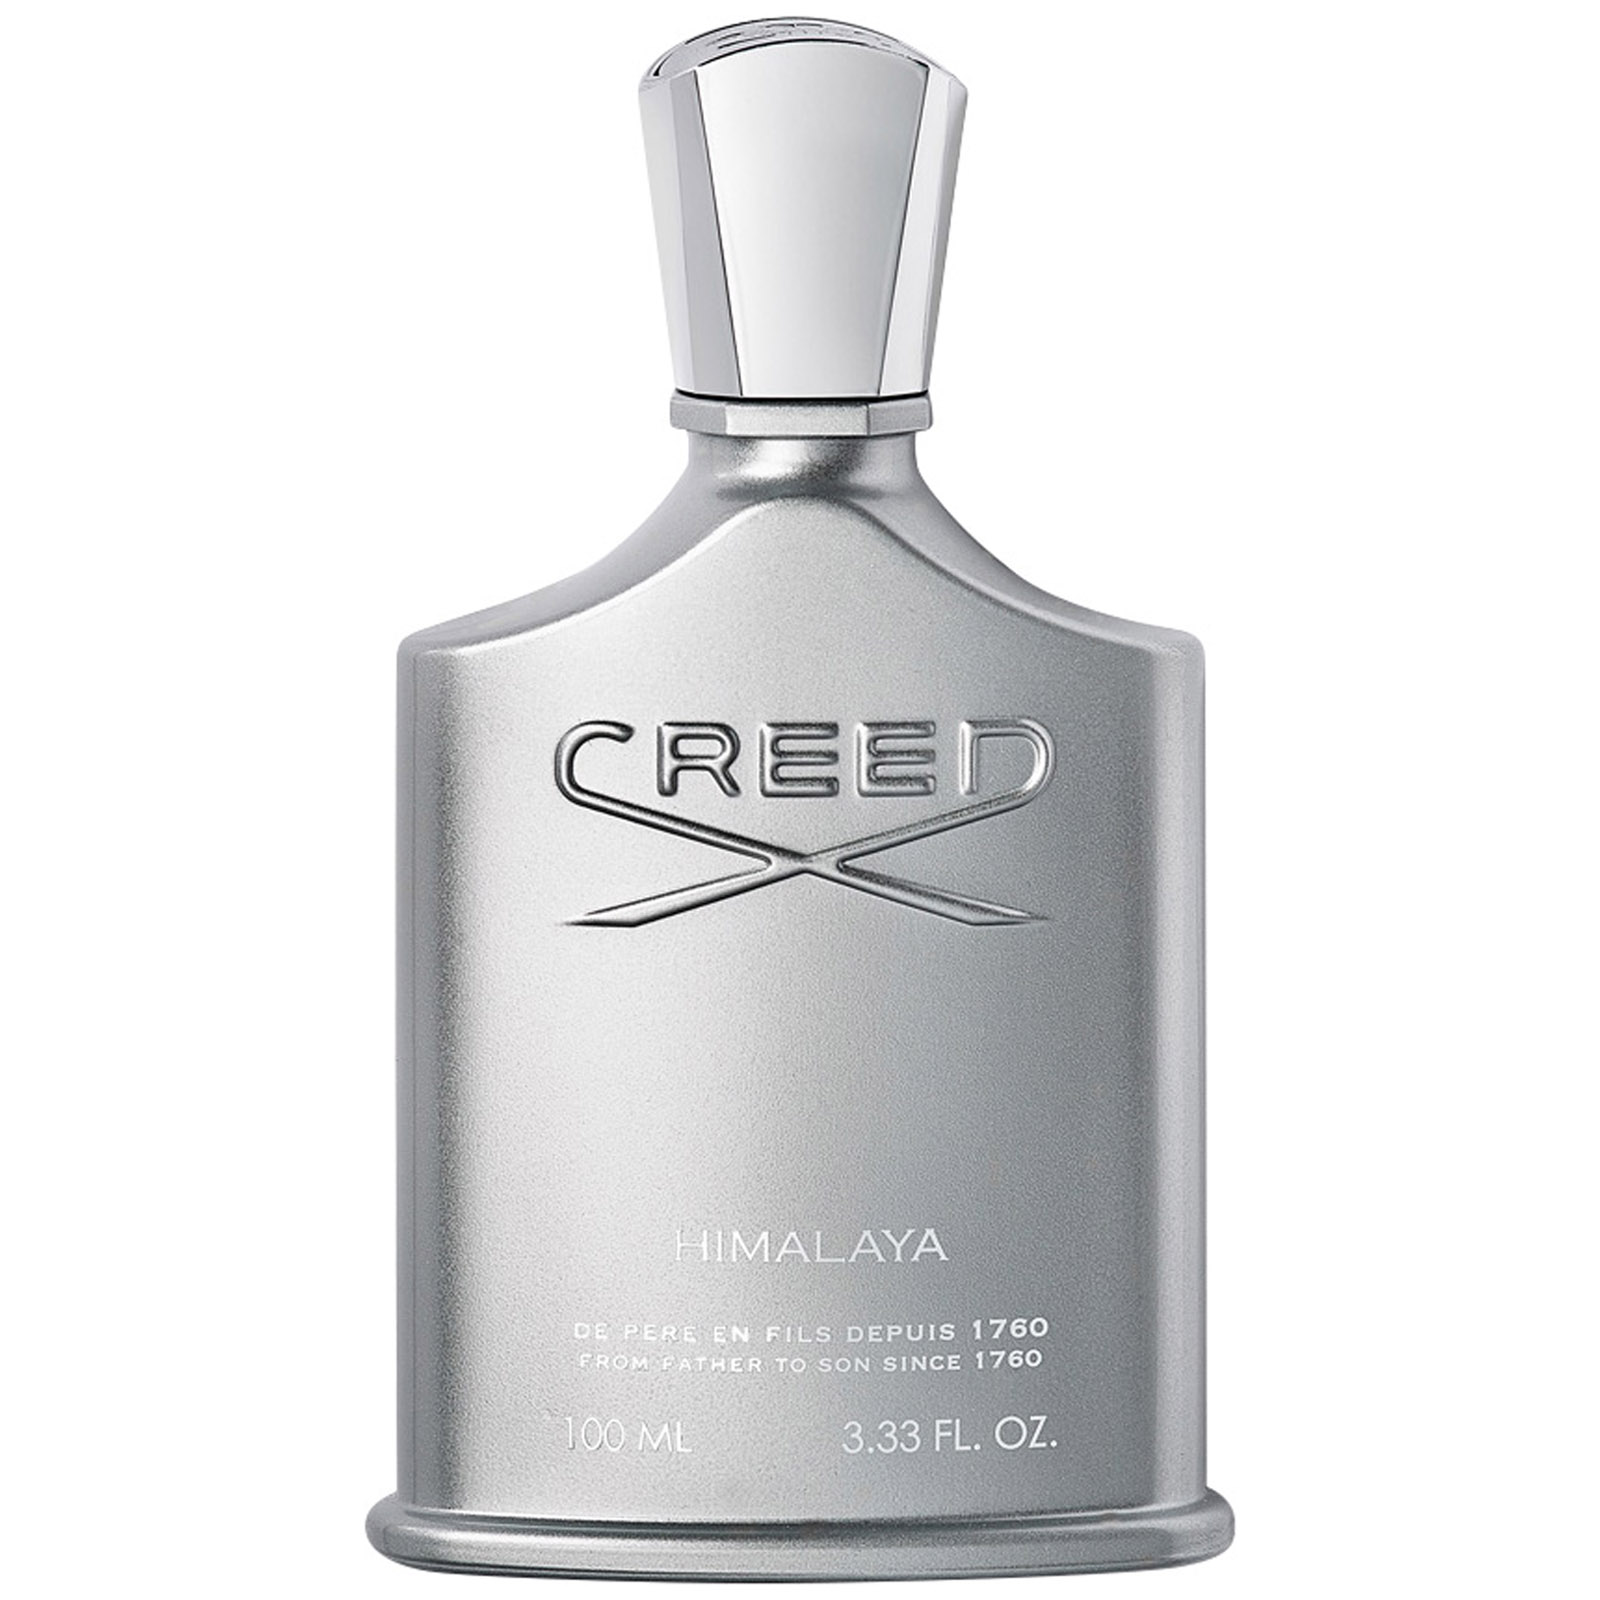 Himalaya millésime profumo eau de parfum 100 ml